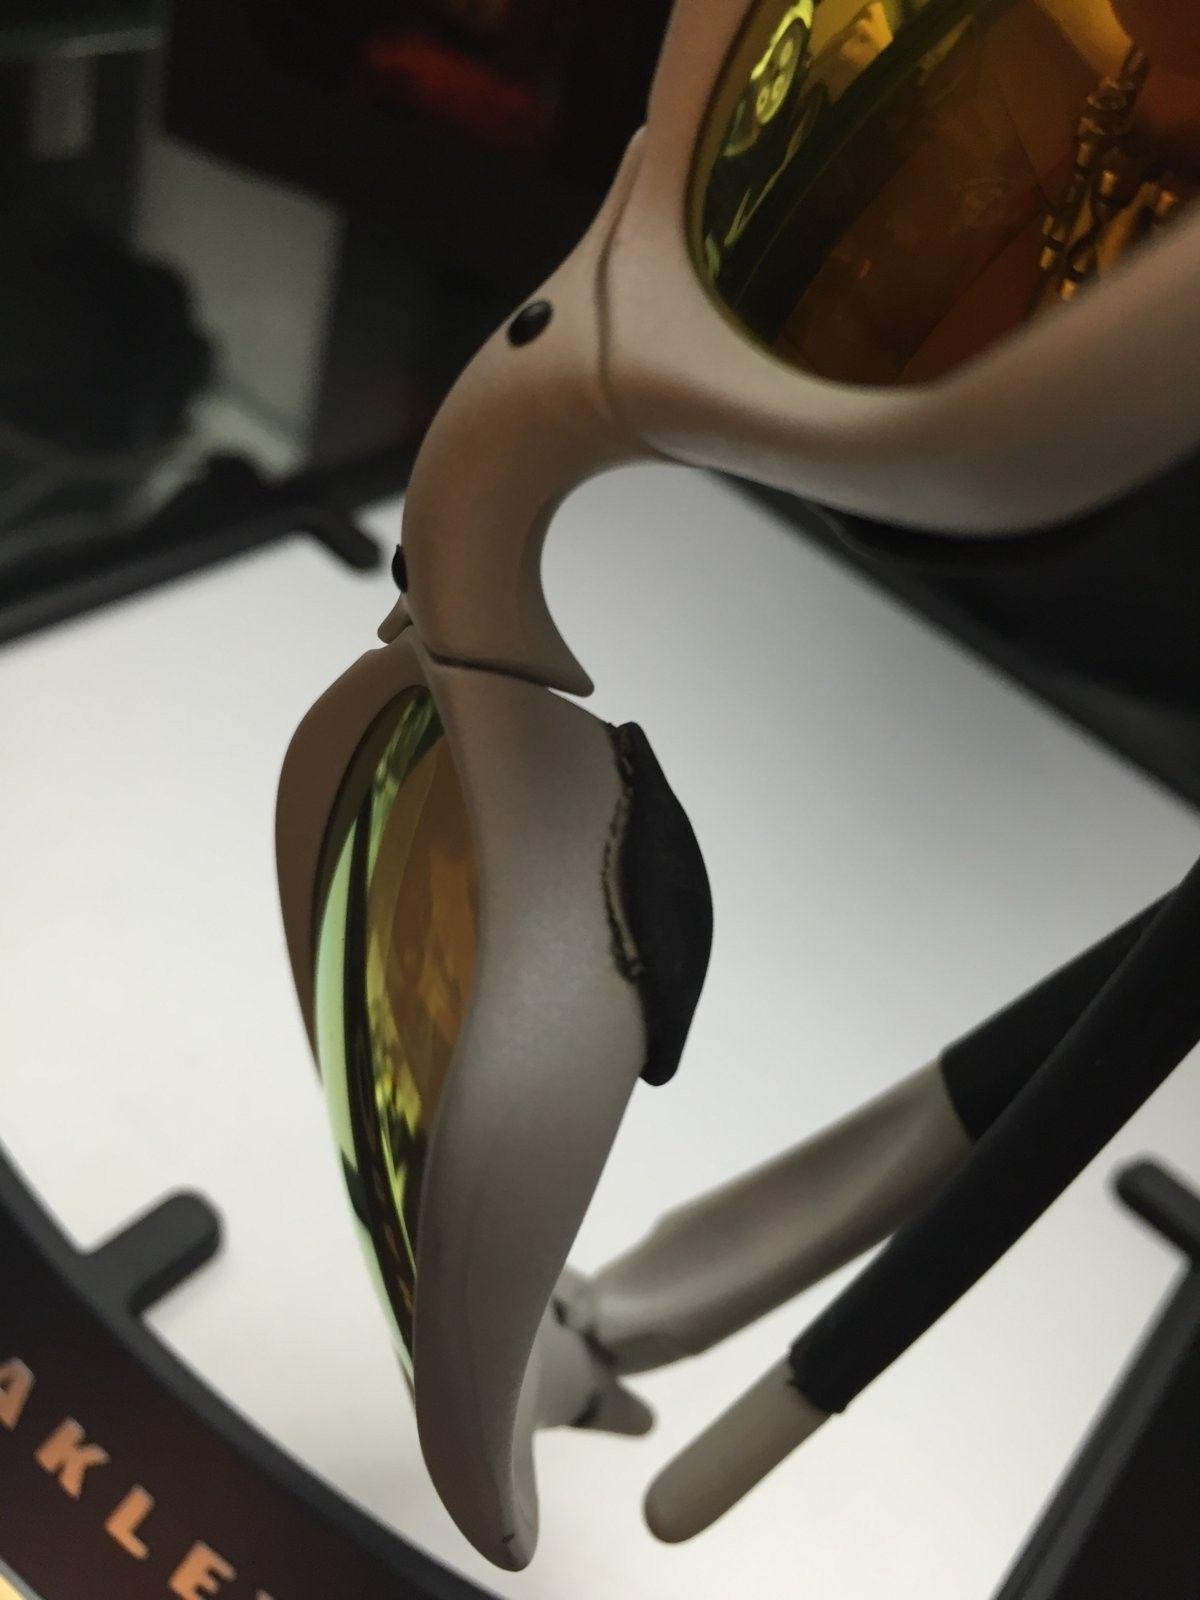 Magnesium switch pearl w/ fire iridium SKU: 03-820 #SOLD - image.jpeg